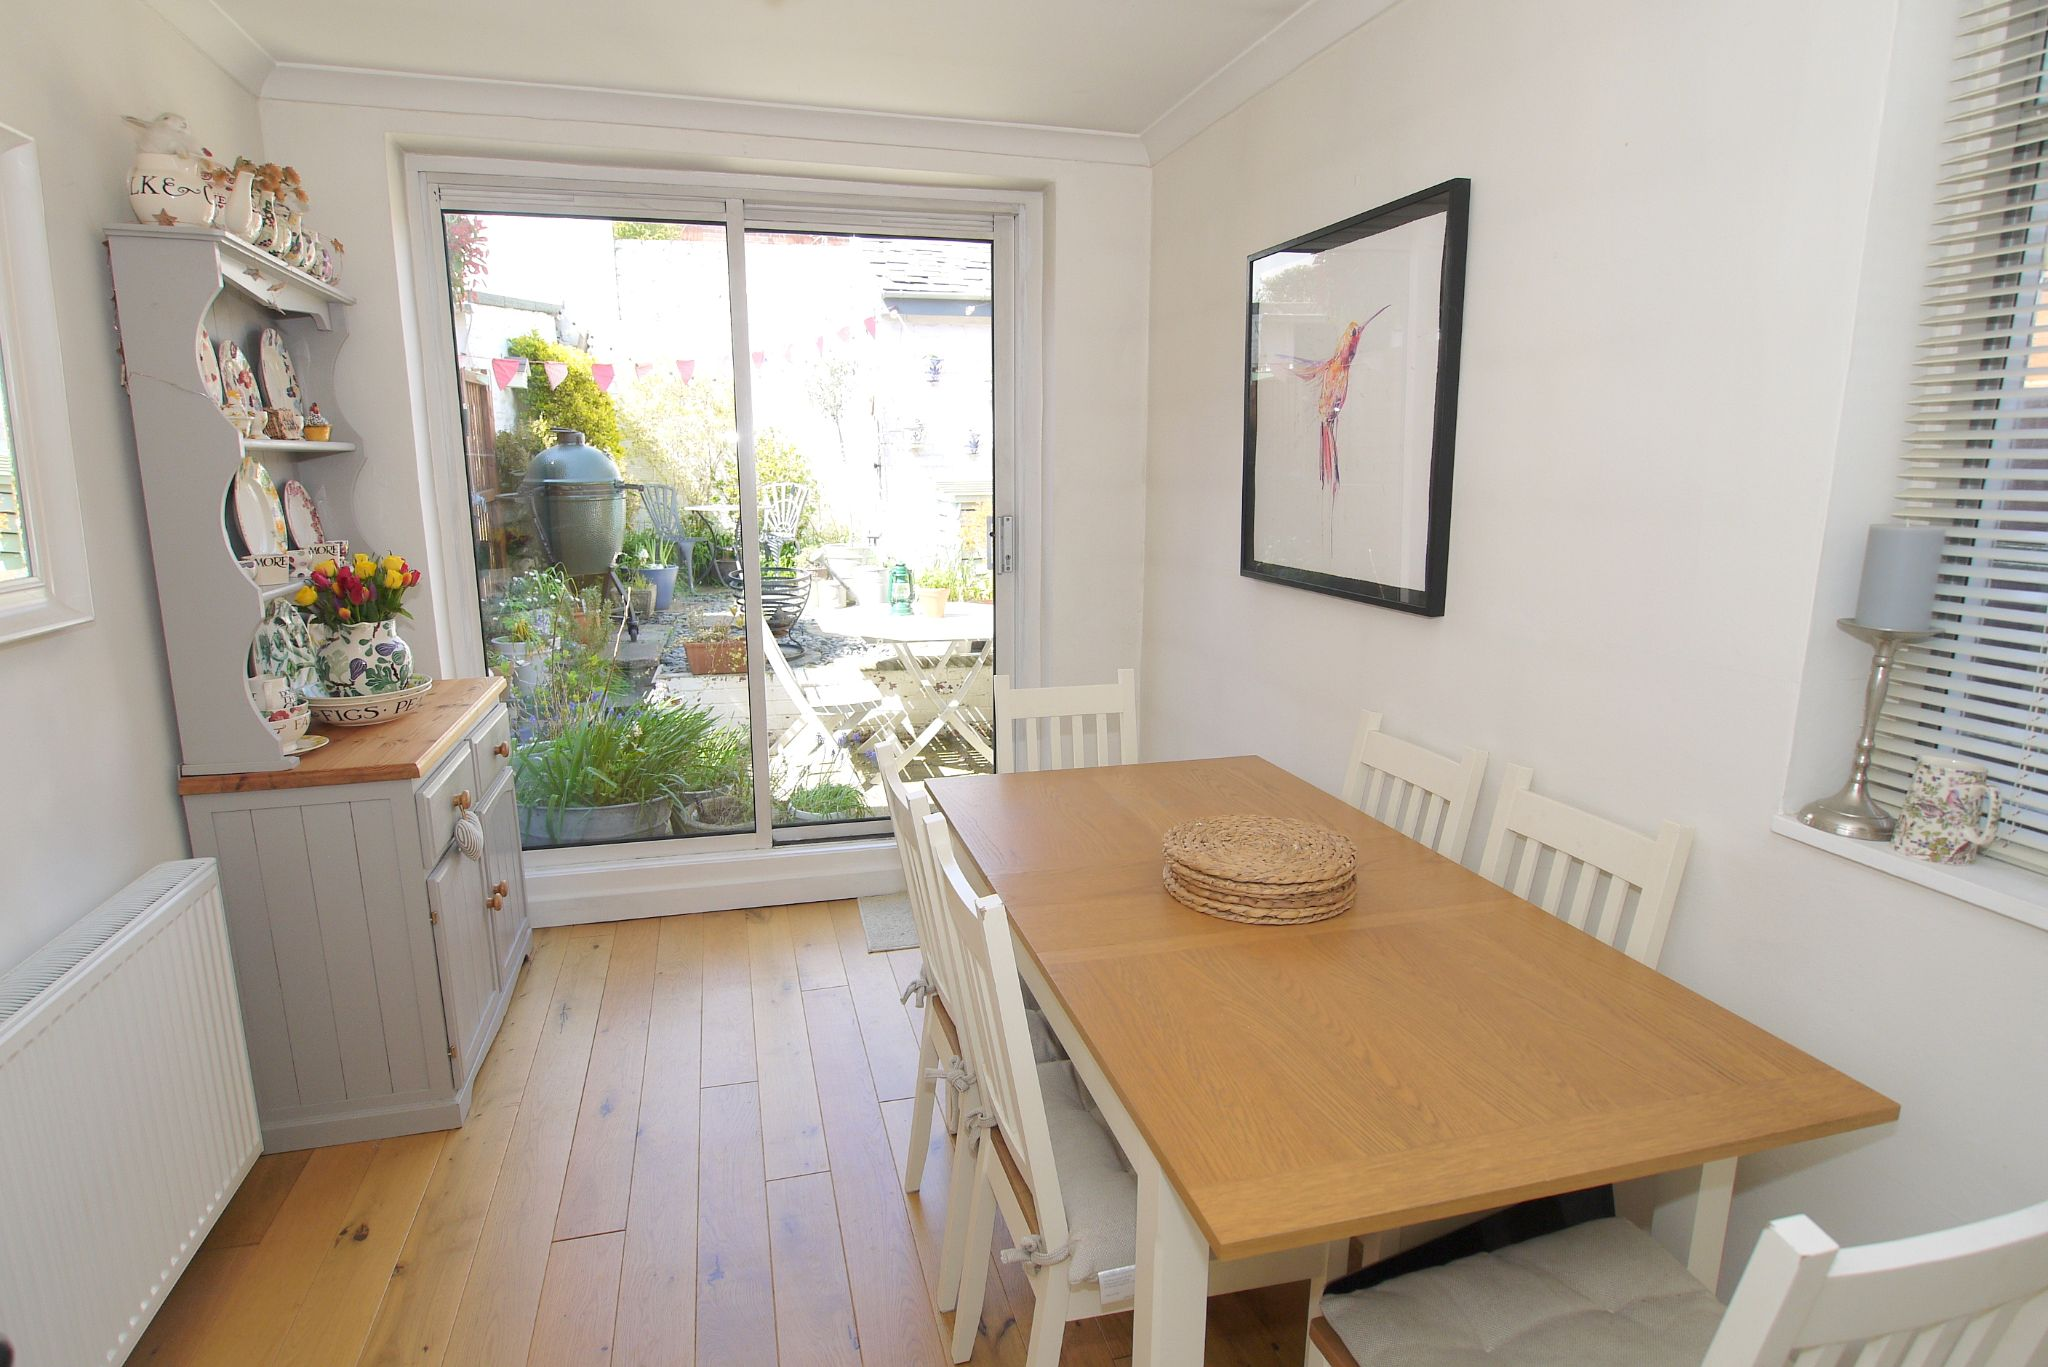 1 bedroom mid terraced house Sold in Sevenoaks - Photograph 4